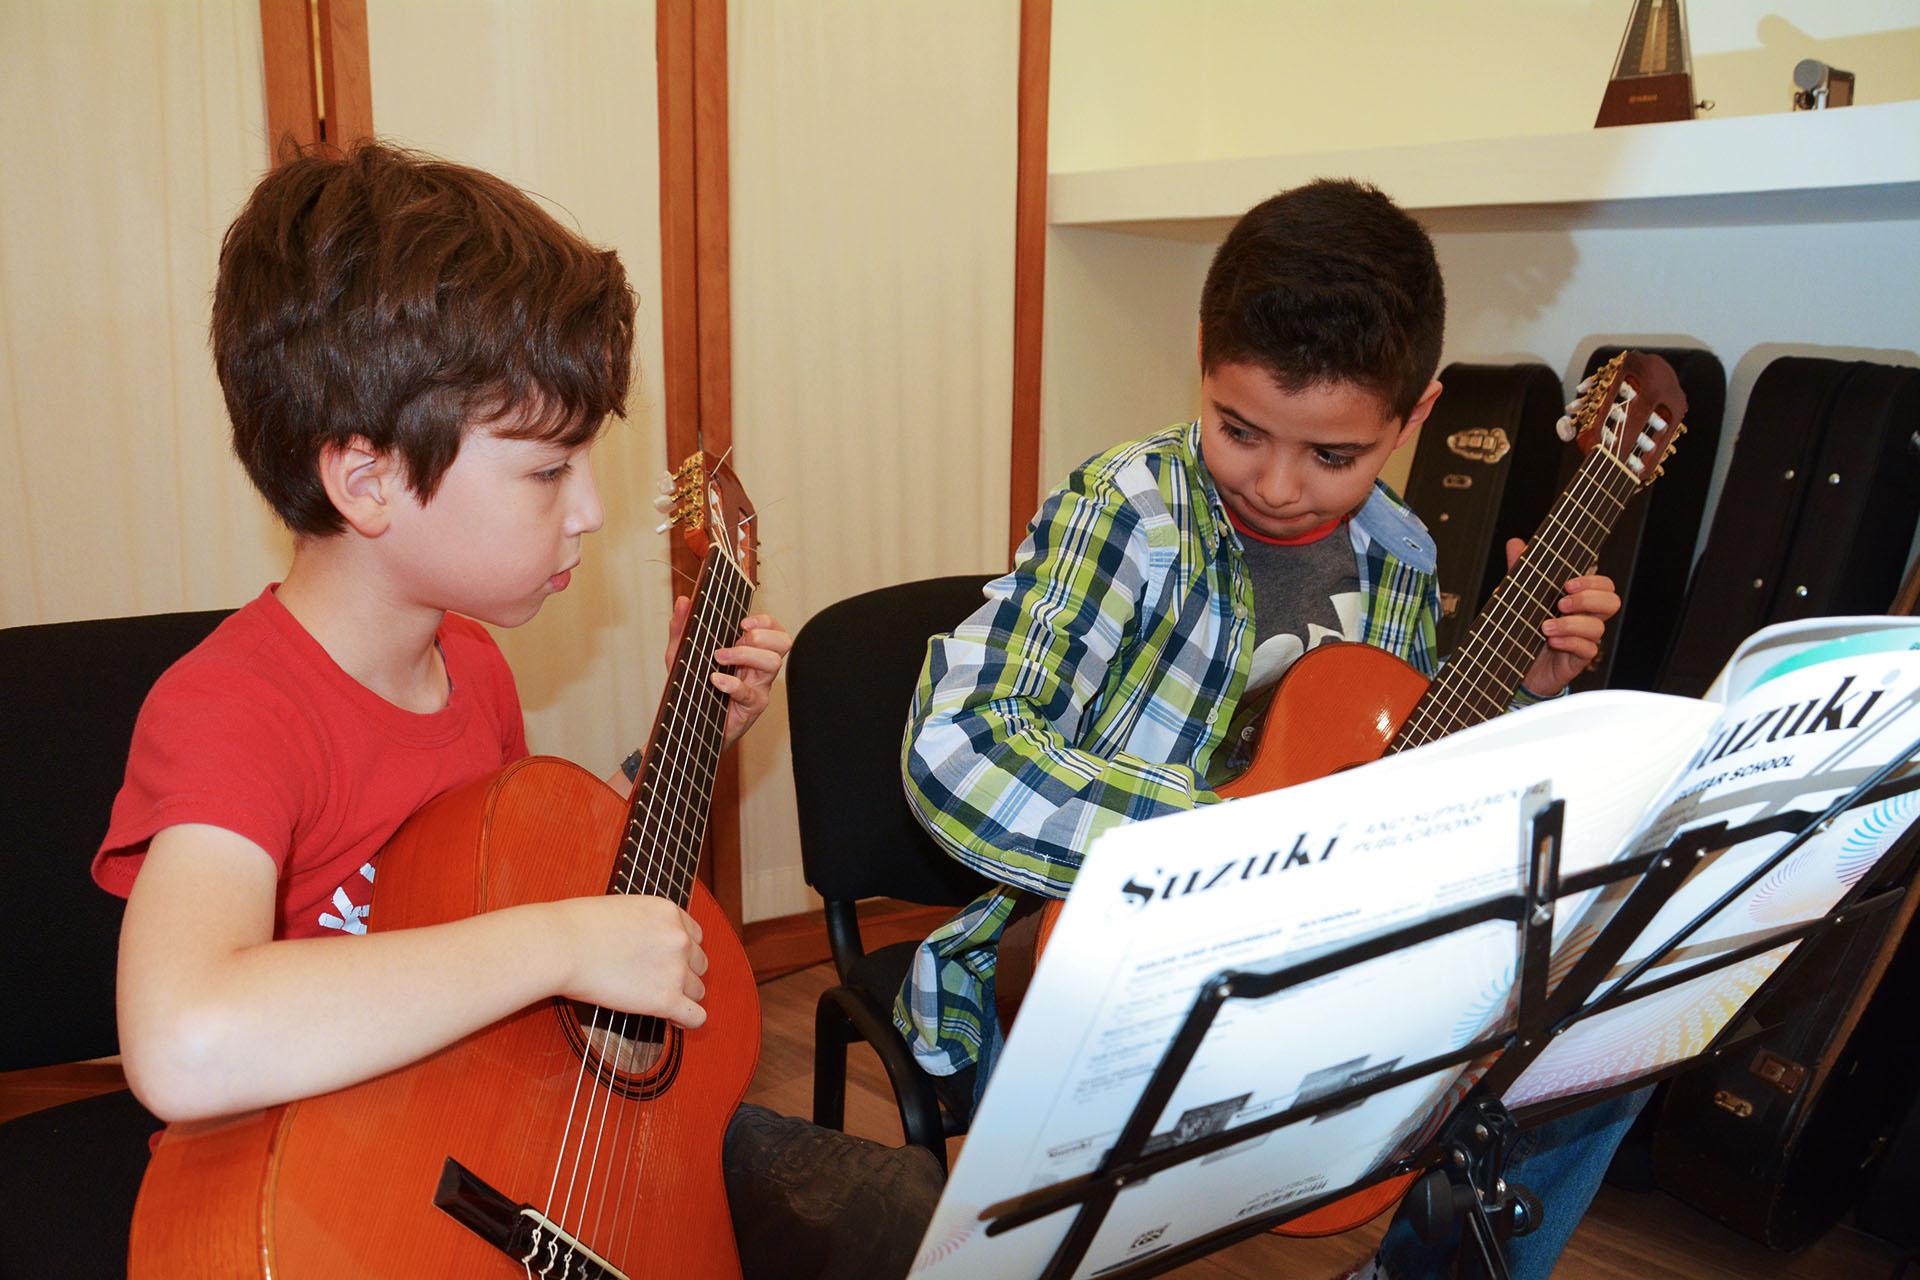 Escuela de música, Clases de guitarra, Método suzuki, clases de guitarra acustica, clases de guitarra clásica, método suzuki guitarra, clases de música para principiantes, clases de música para niños, clases de musica para adultos, certificación school of music, curso de guitarra, curso de guitarra para niño